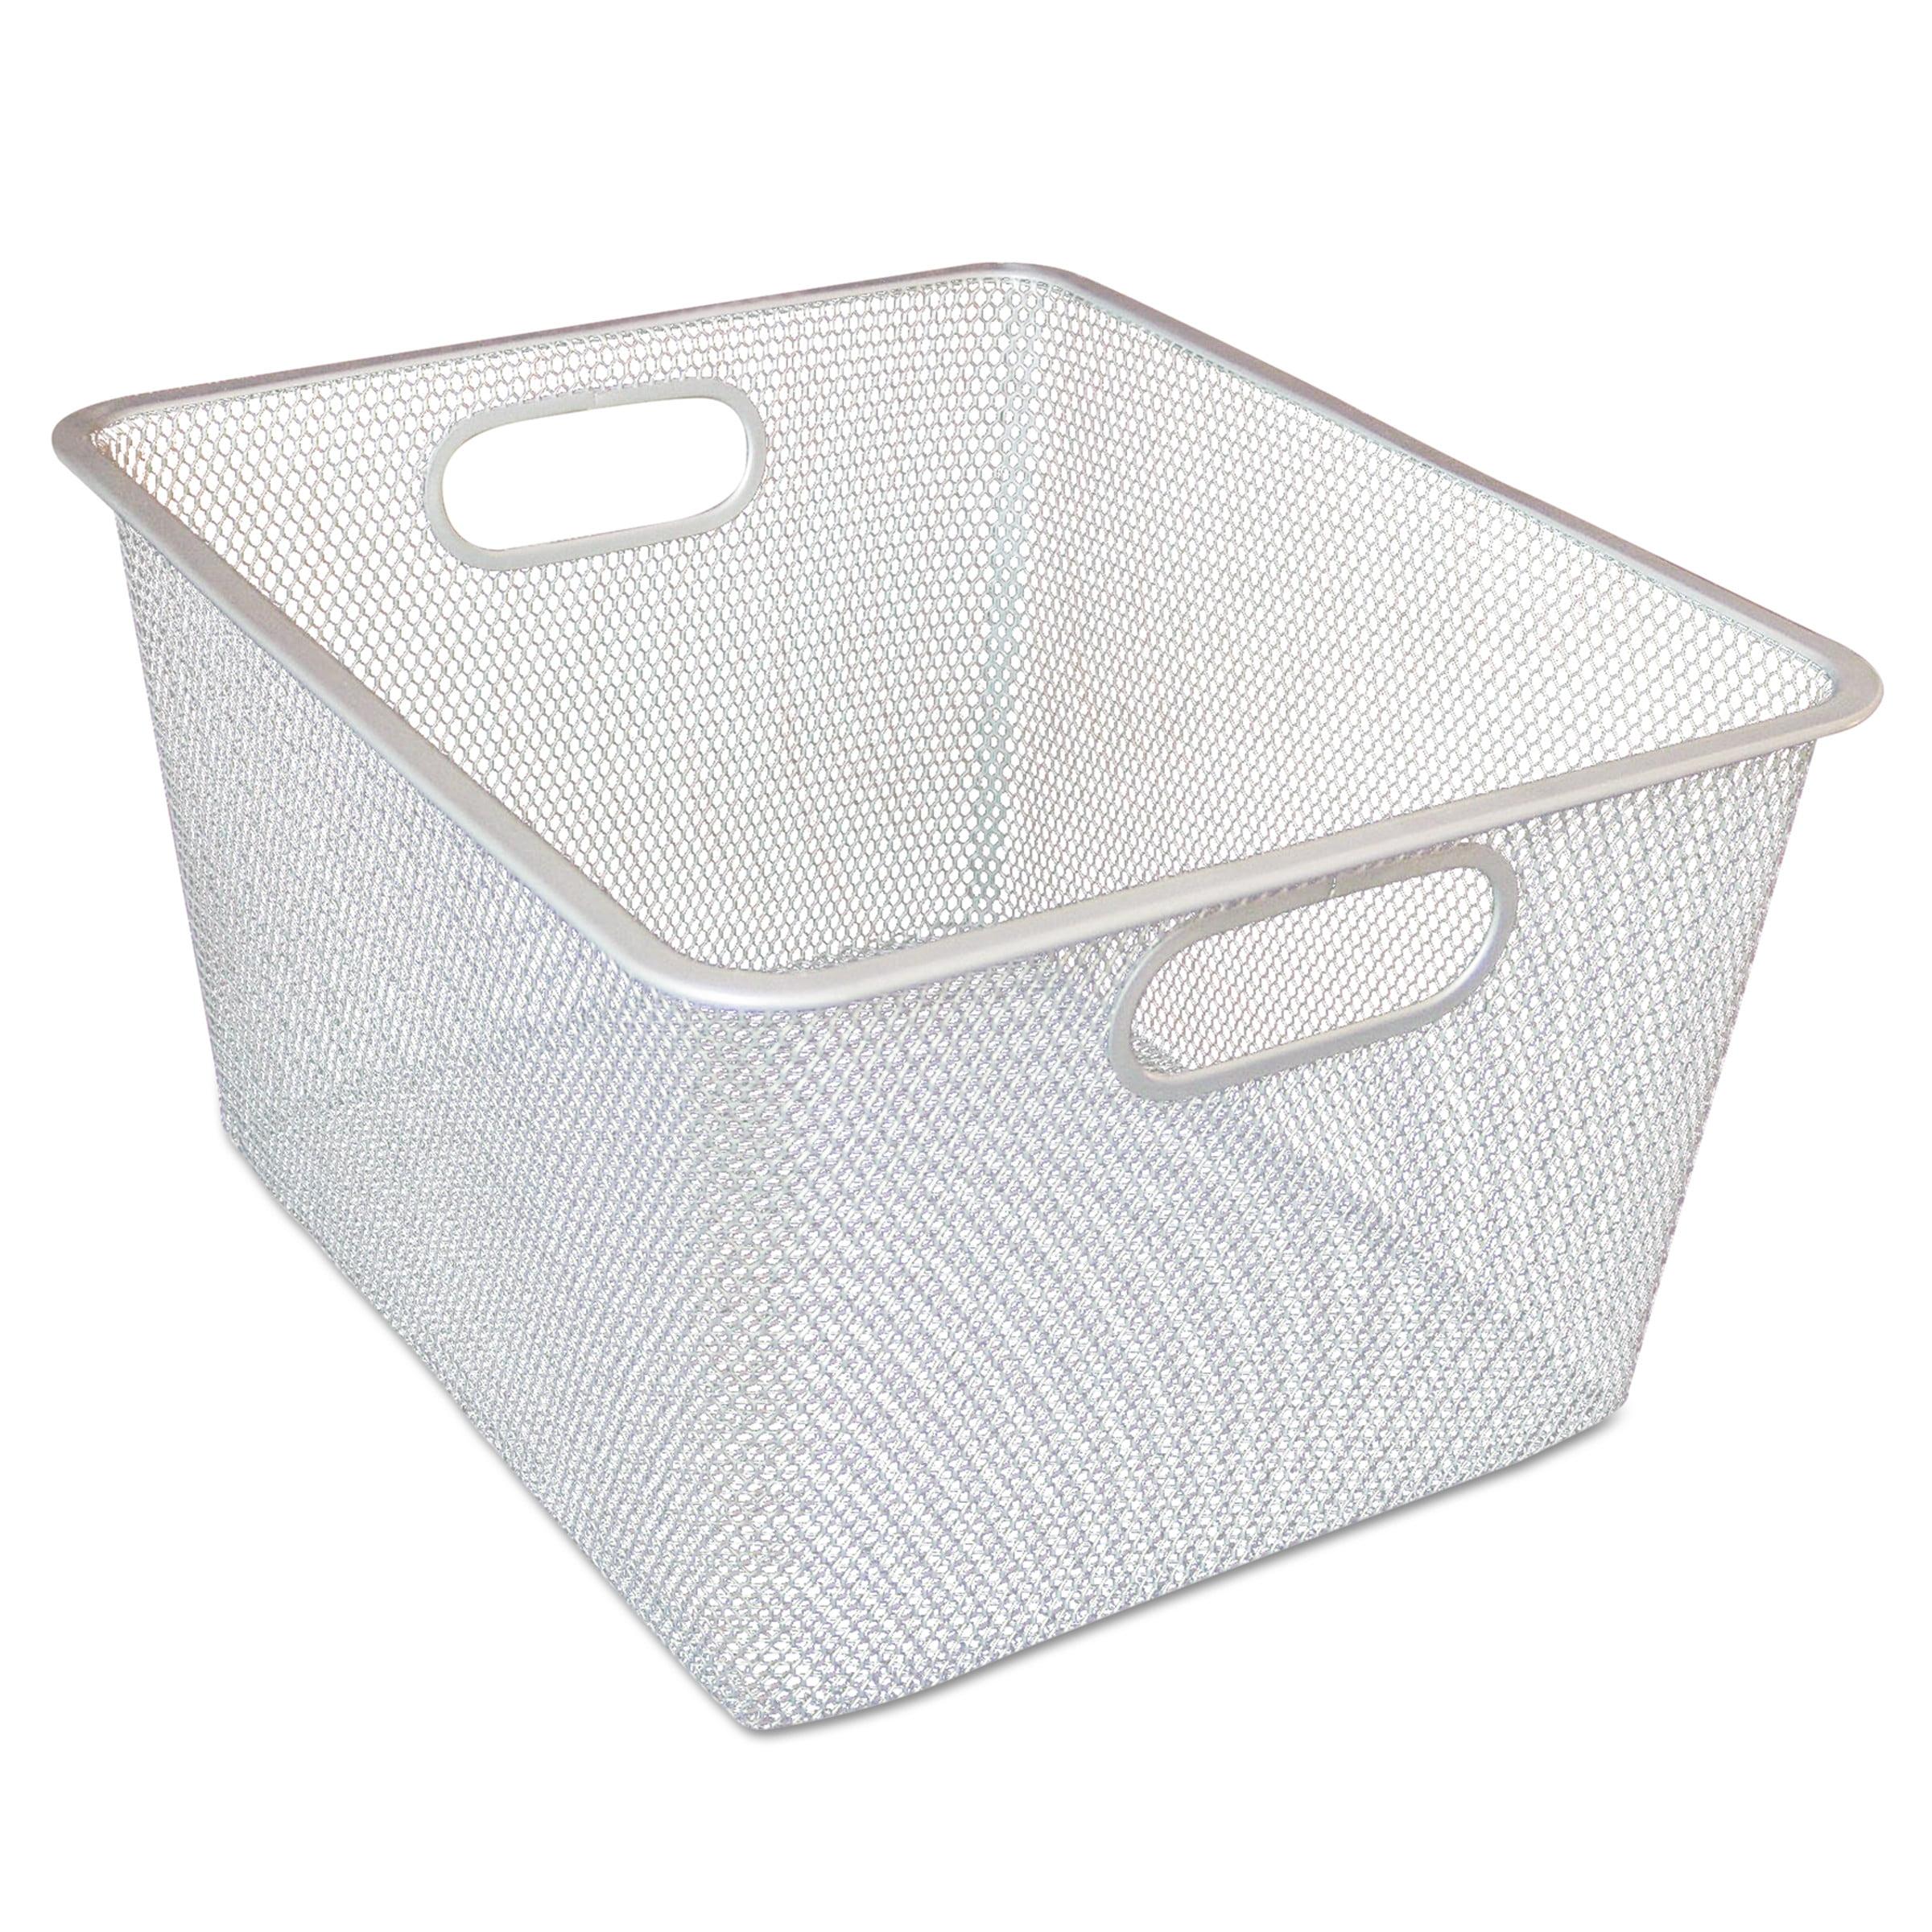 Alera Wire Mesh Nesting Shelving Baskets, 12 x 14 x 7 3/4, Silver, 2/Set